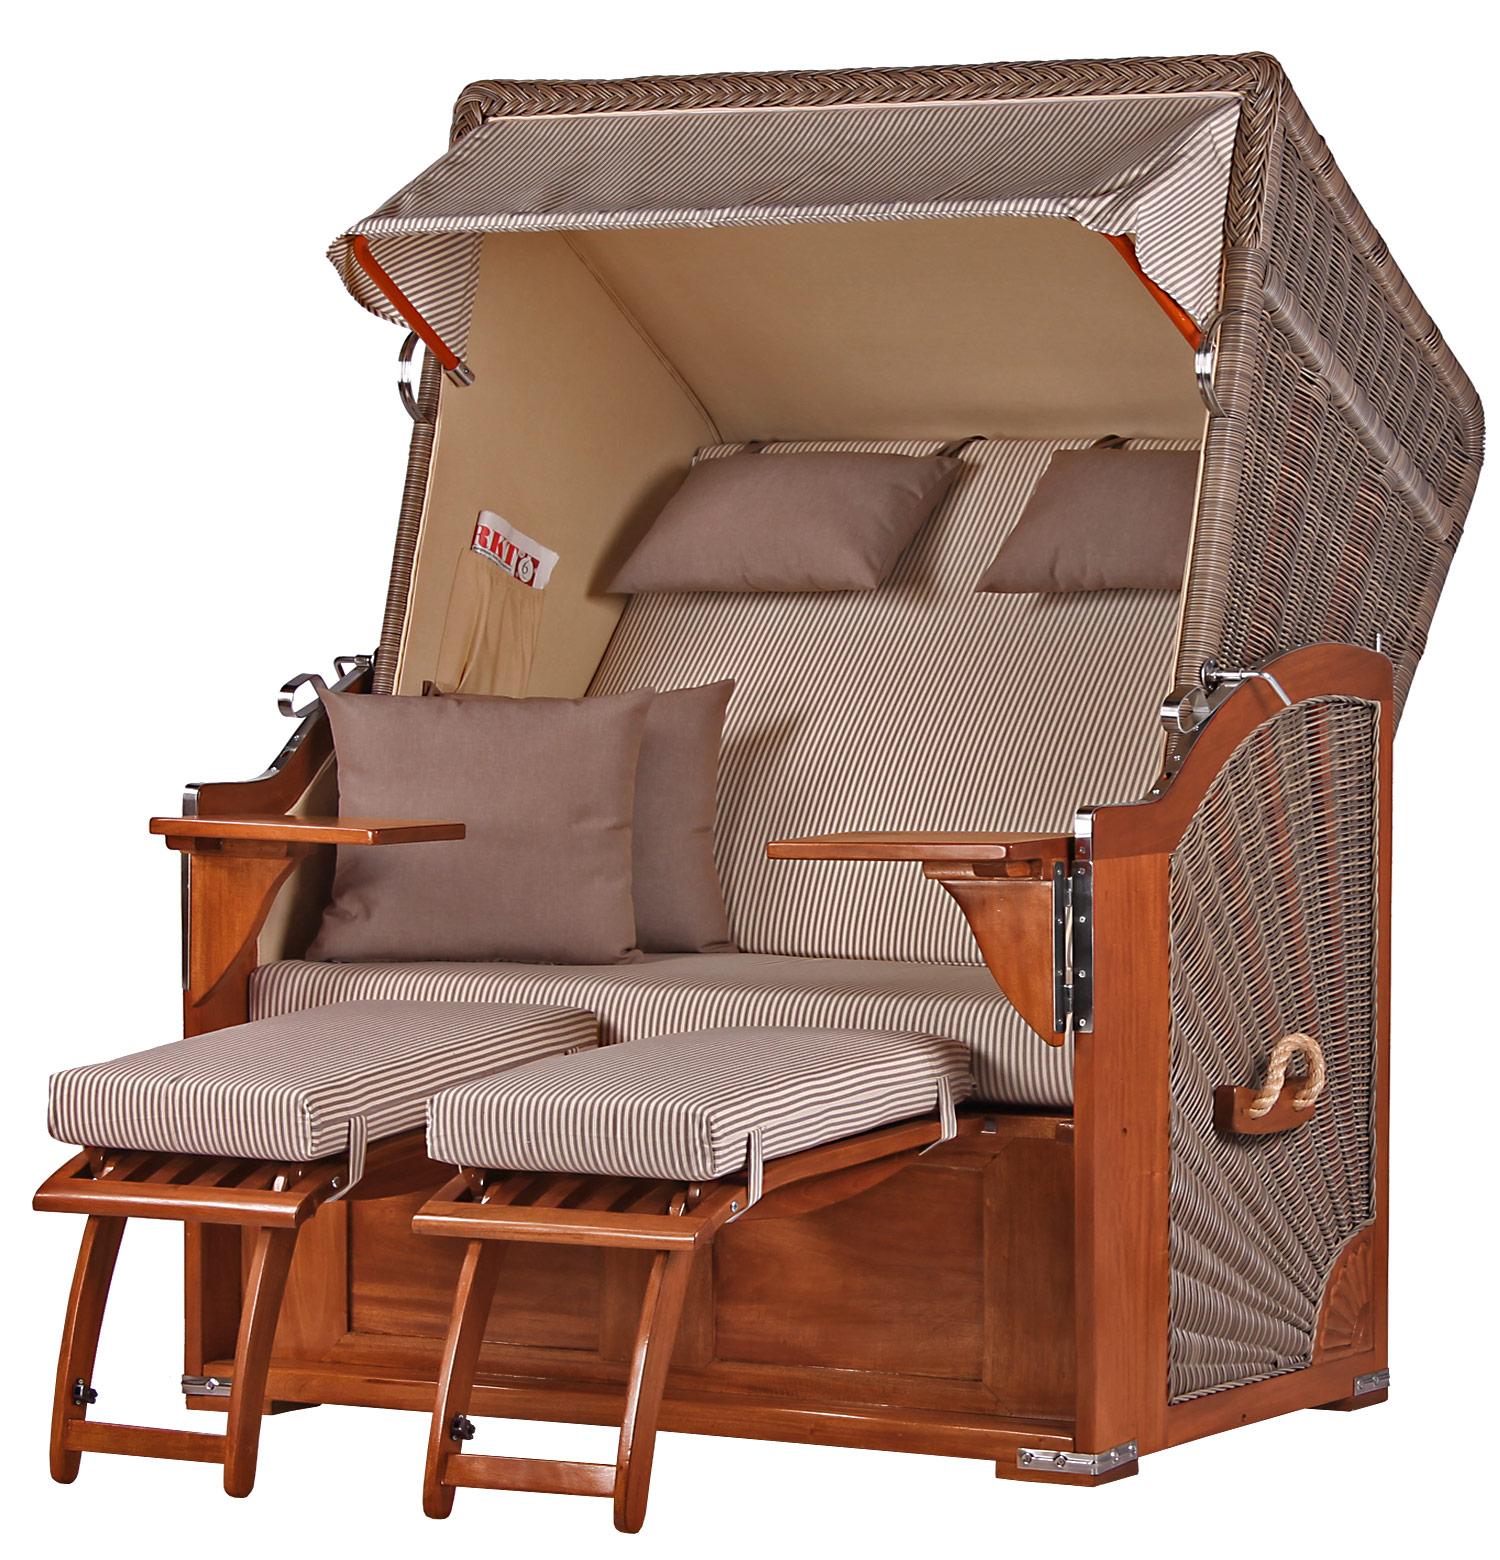 mahagoni strandkorb keitum mahagoni vollholz 2 sitzer wechselpolster. Black Bedroom Furniture Sets. Home Design Ideas